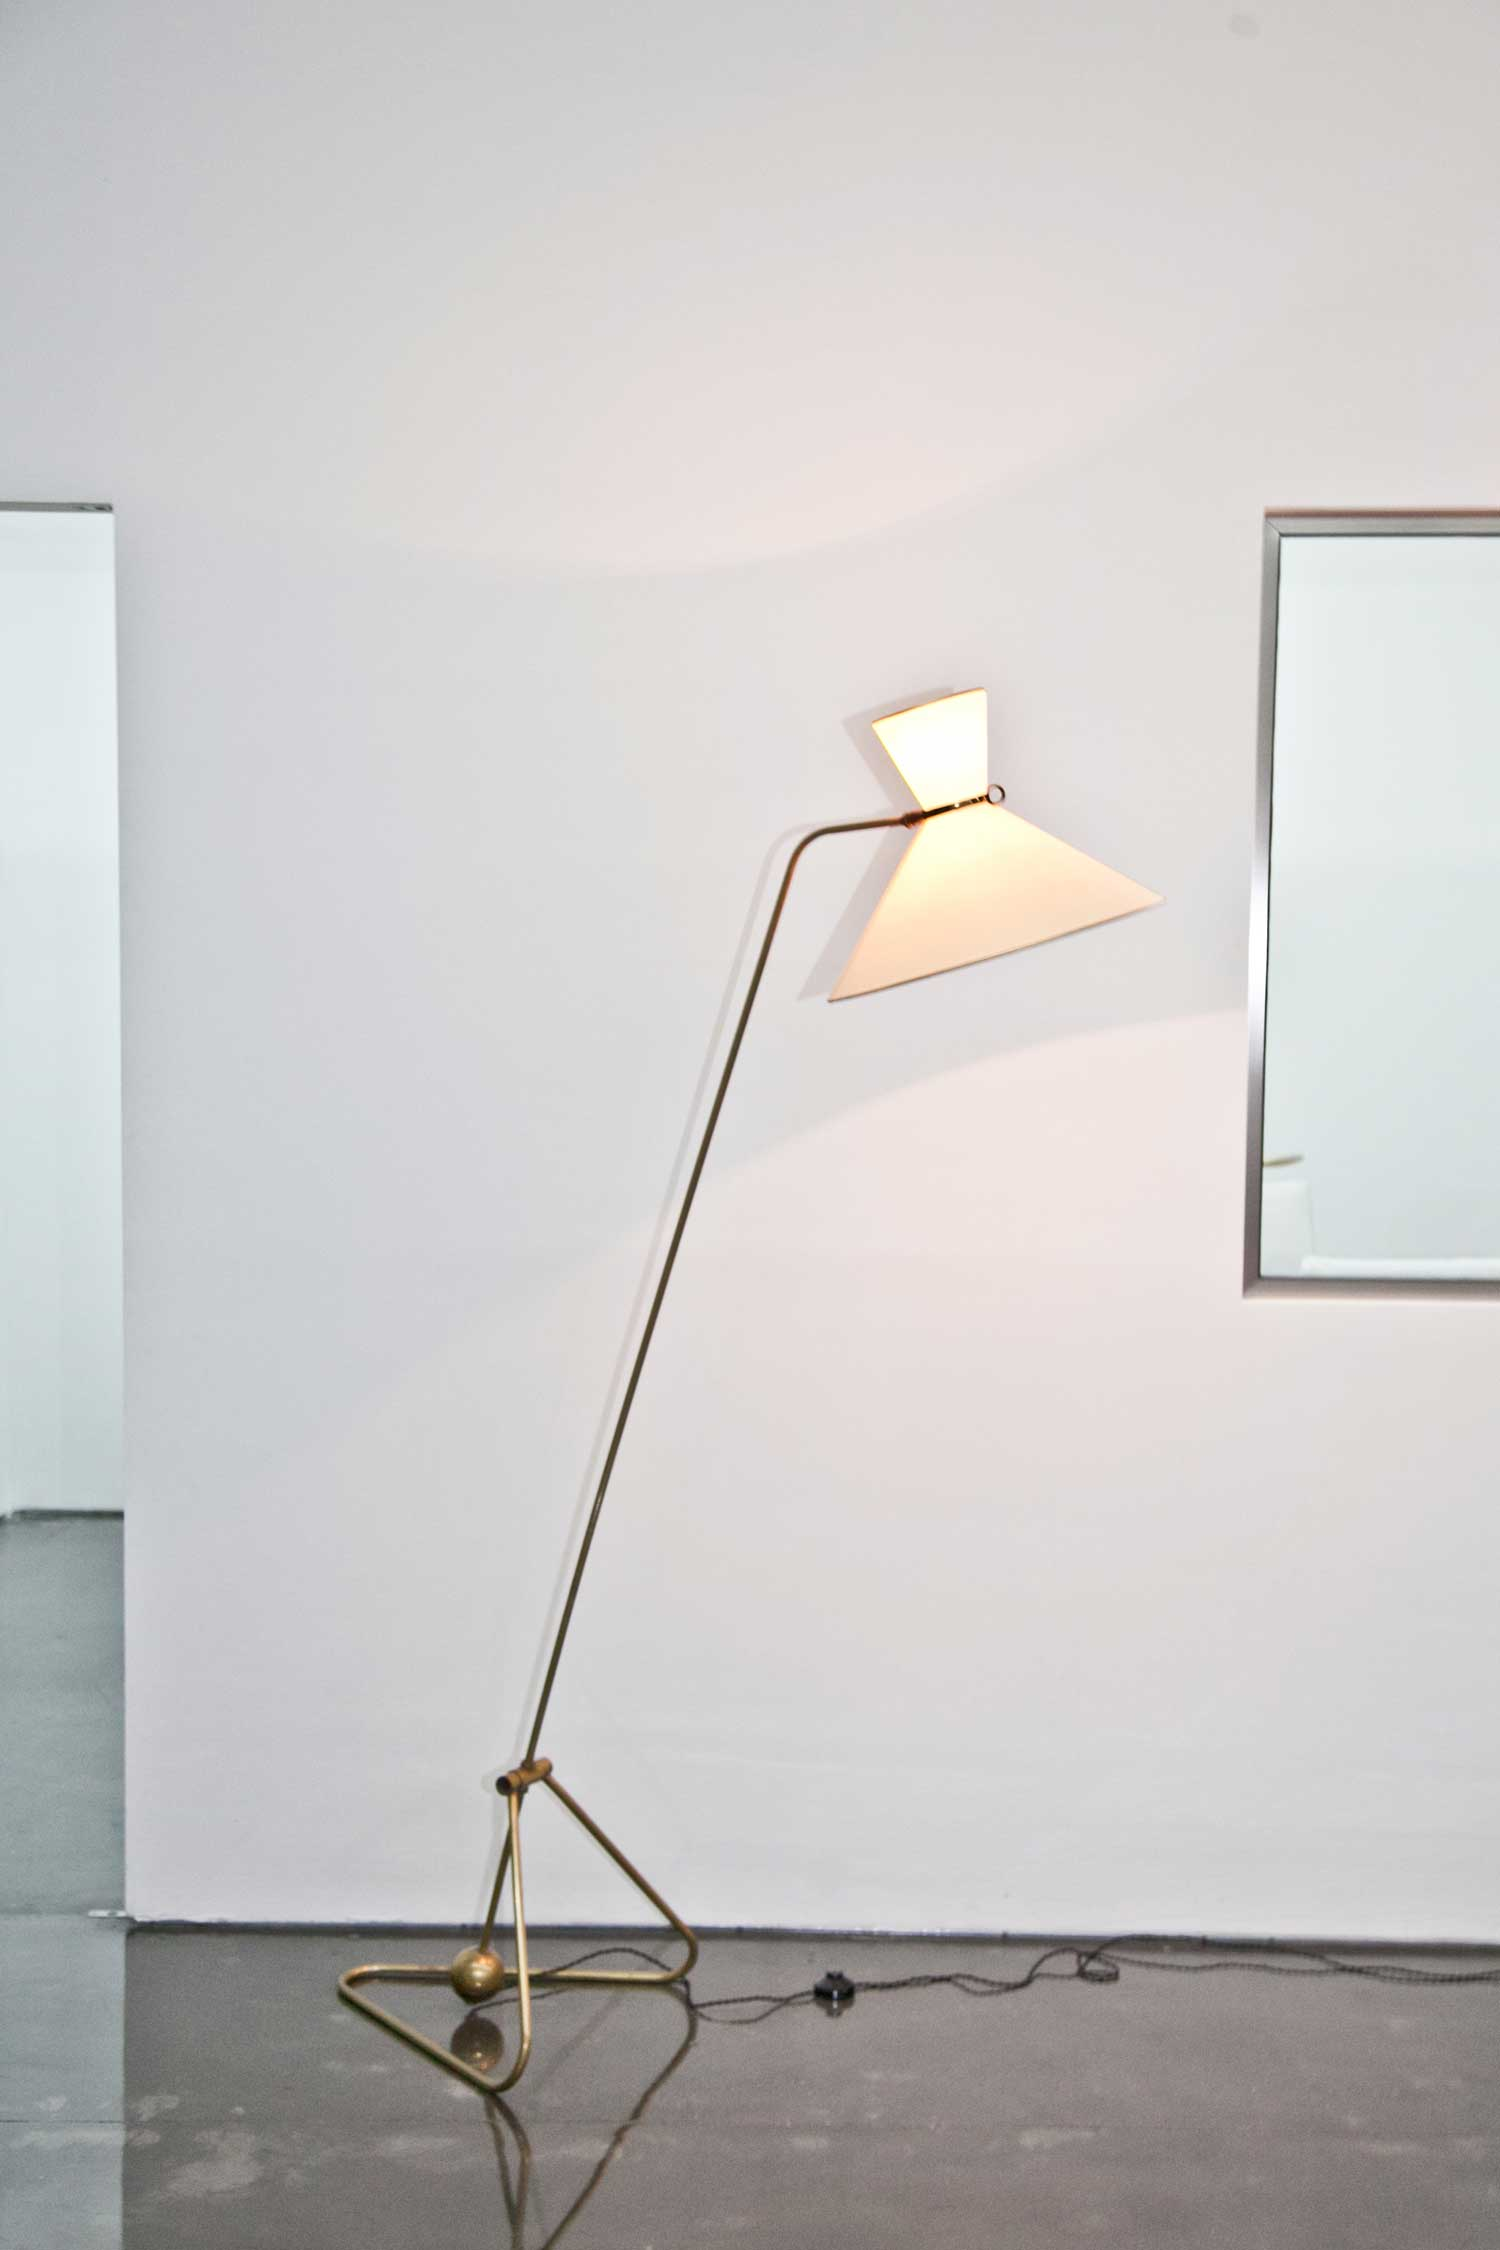 Sneak peek at design days dubai 2014 yellowtrace for Floor lamp dubai